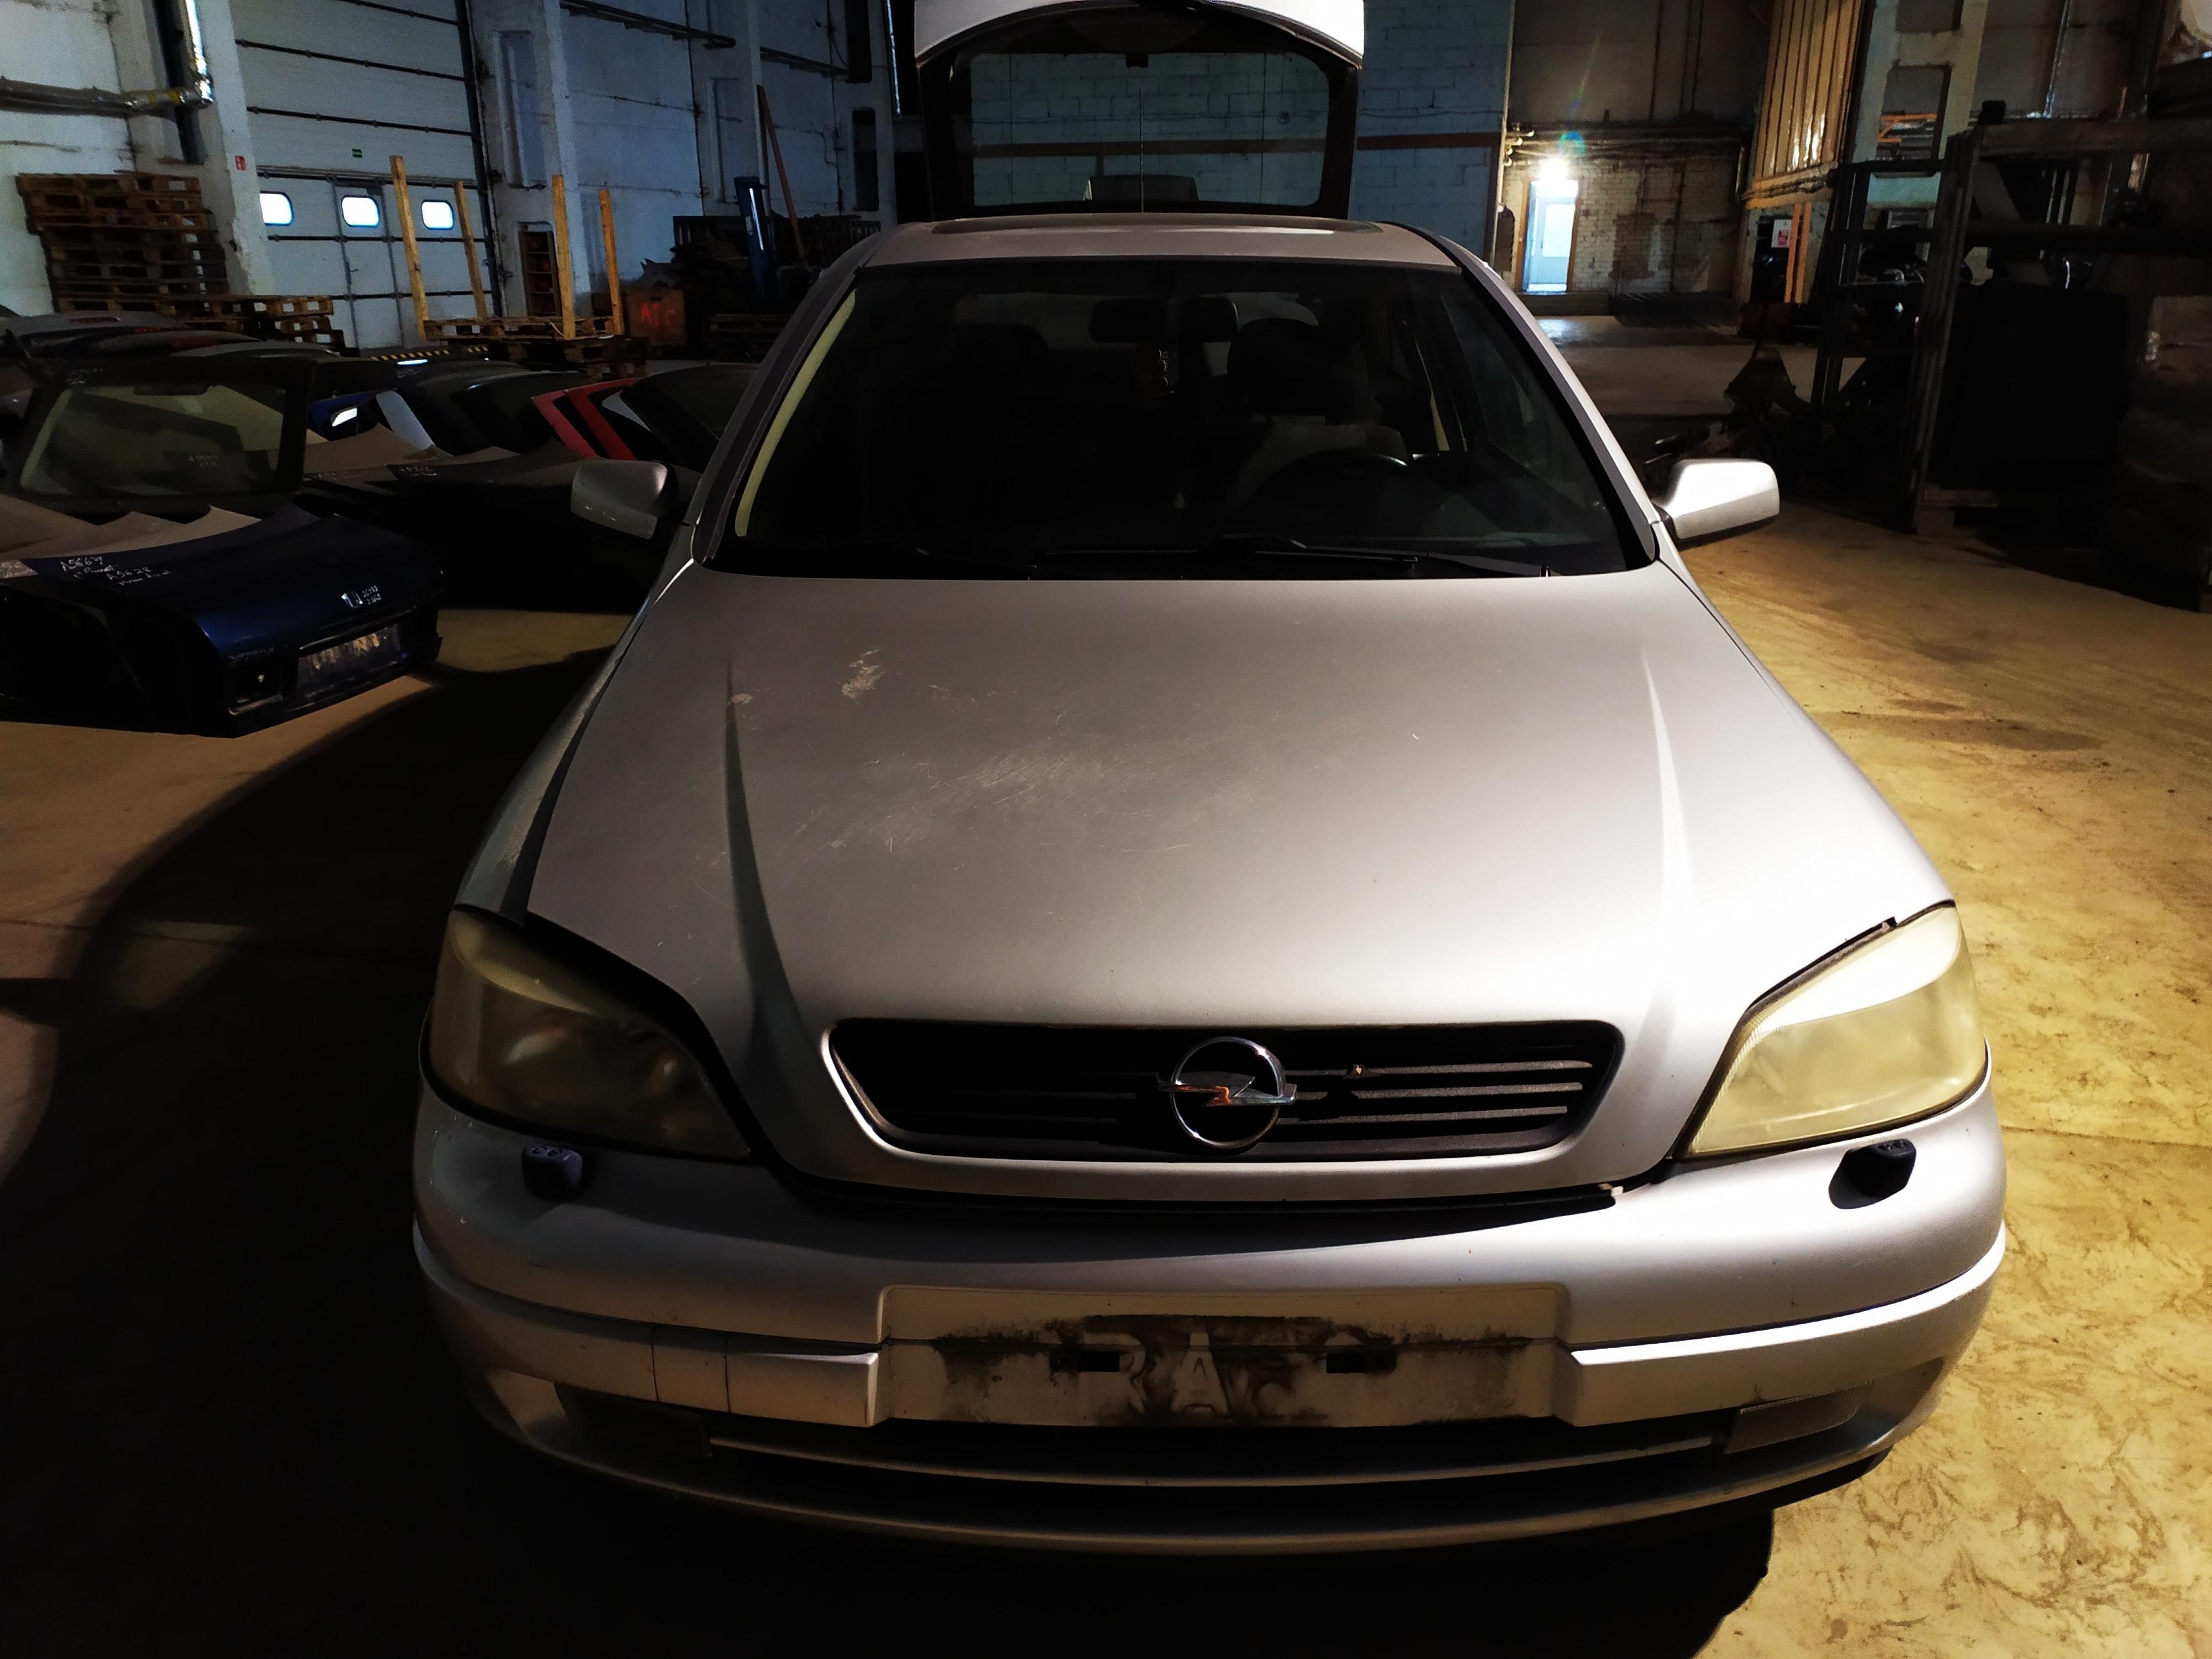 Foto-3 Opel Astra Astra, G 1998.09 - 2004.12 1998 Benzinas 1.6